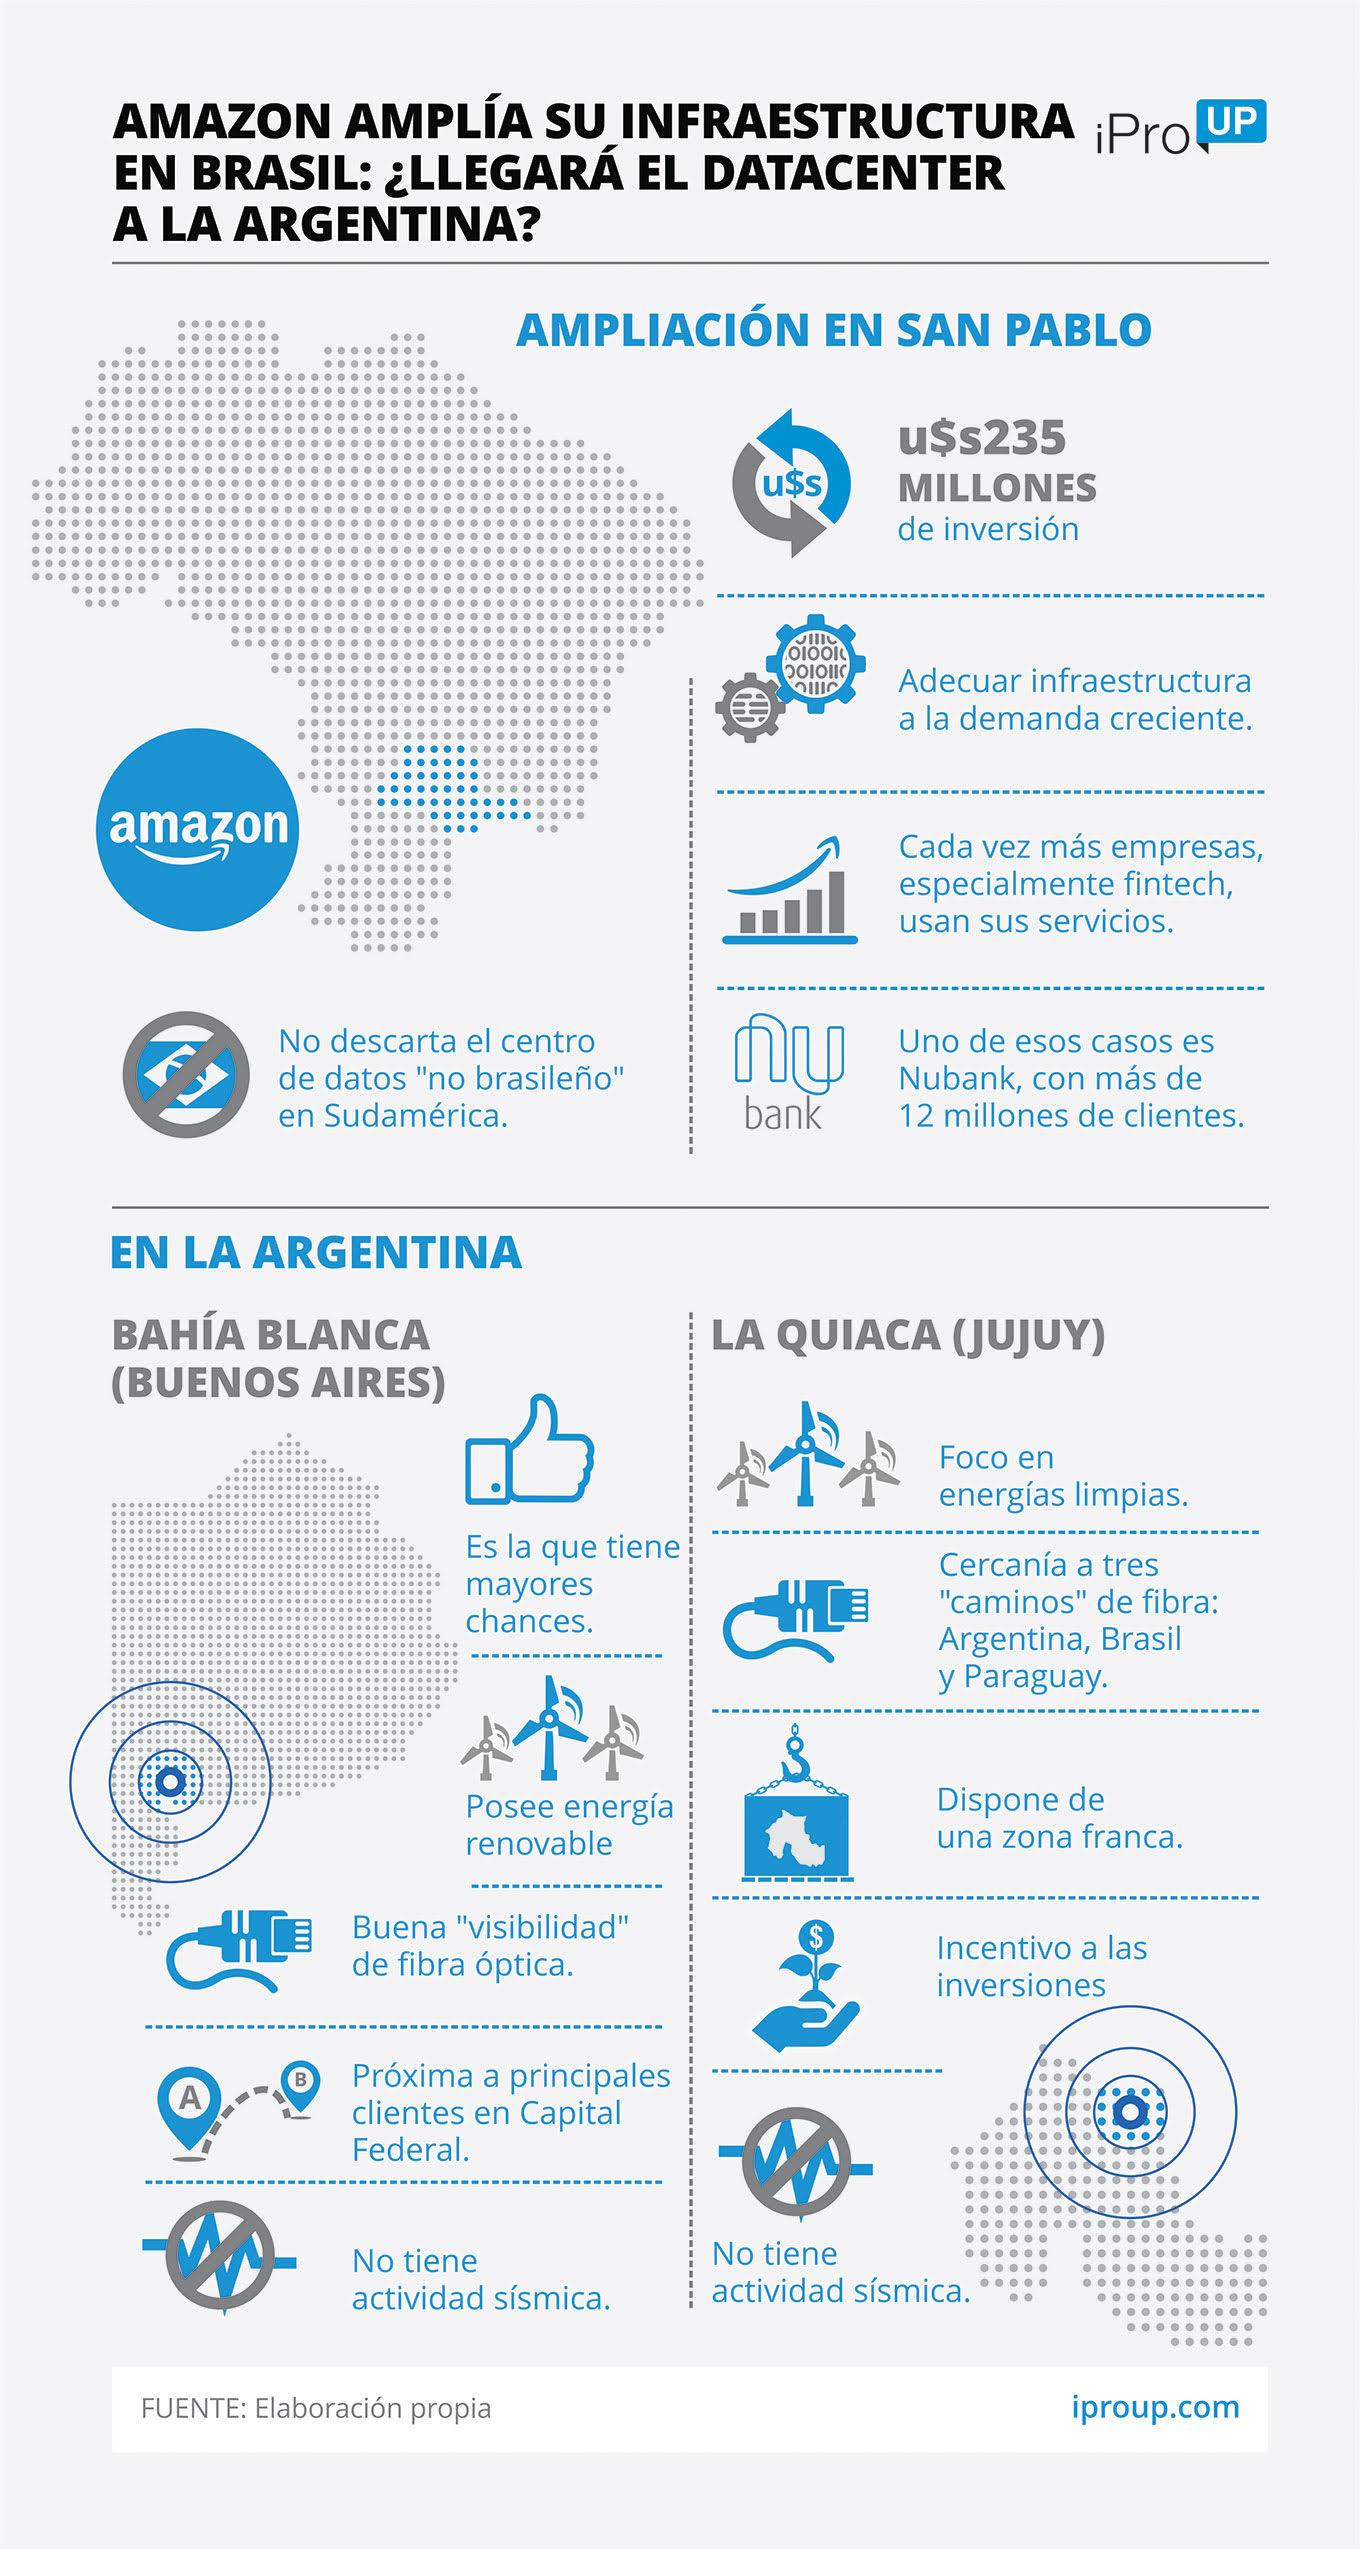 Data center Amazon